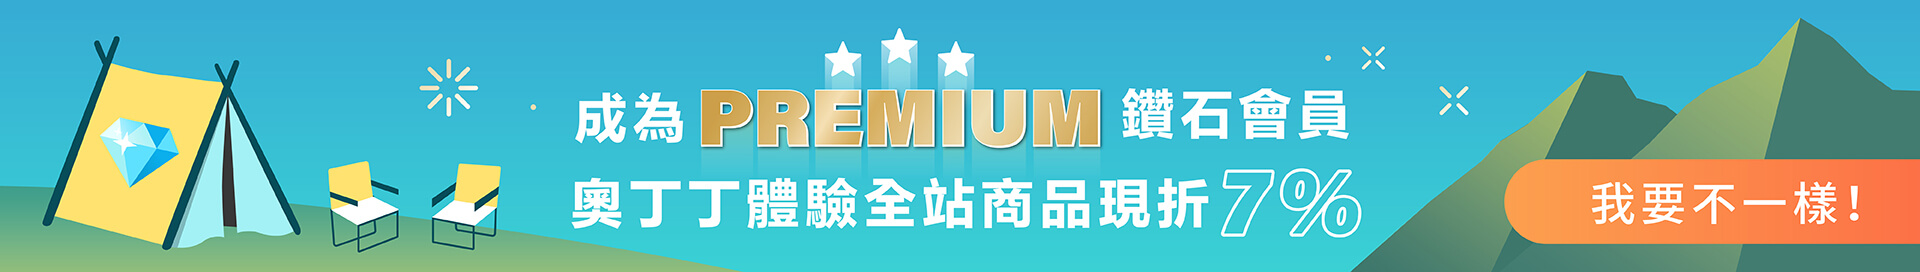 Premium2 萬用banner1